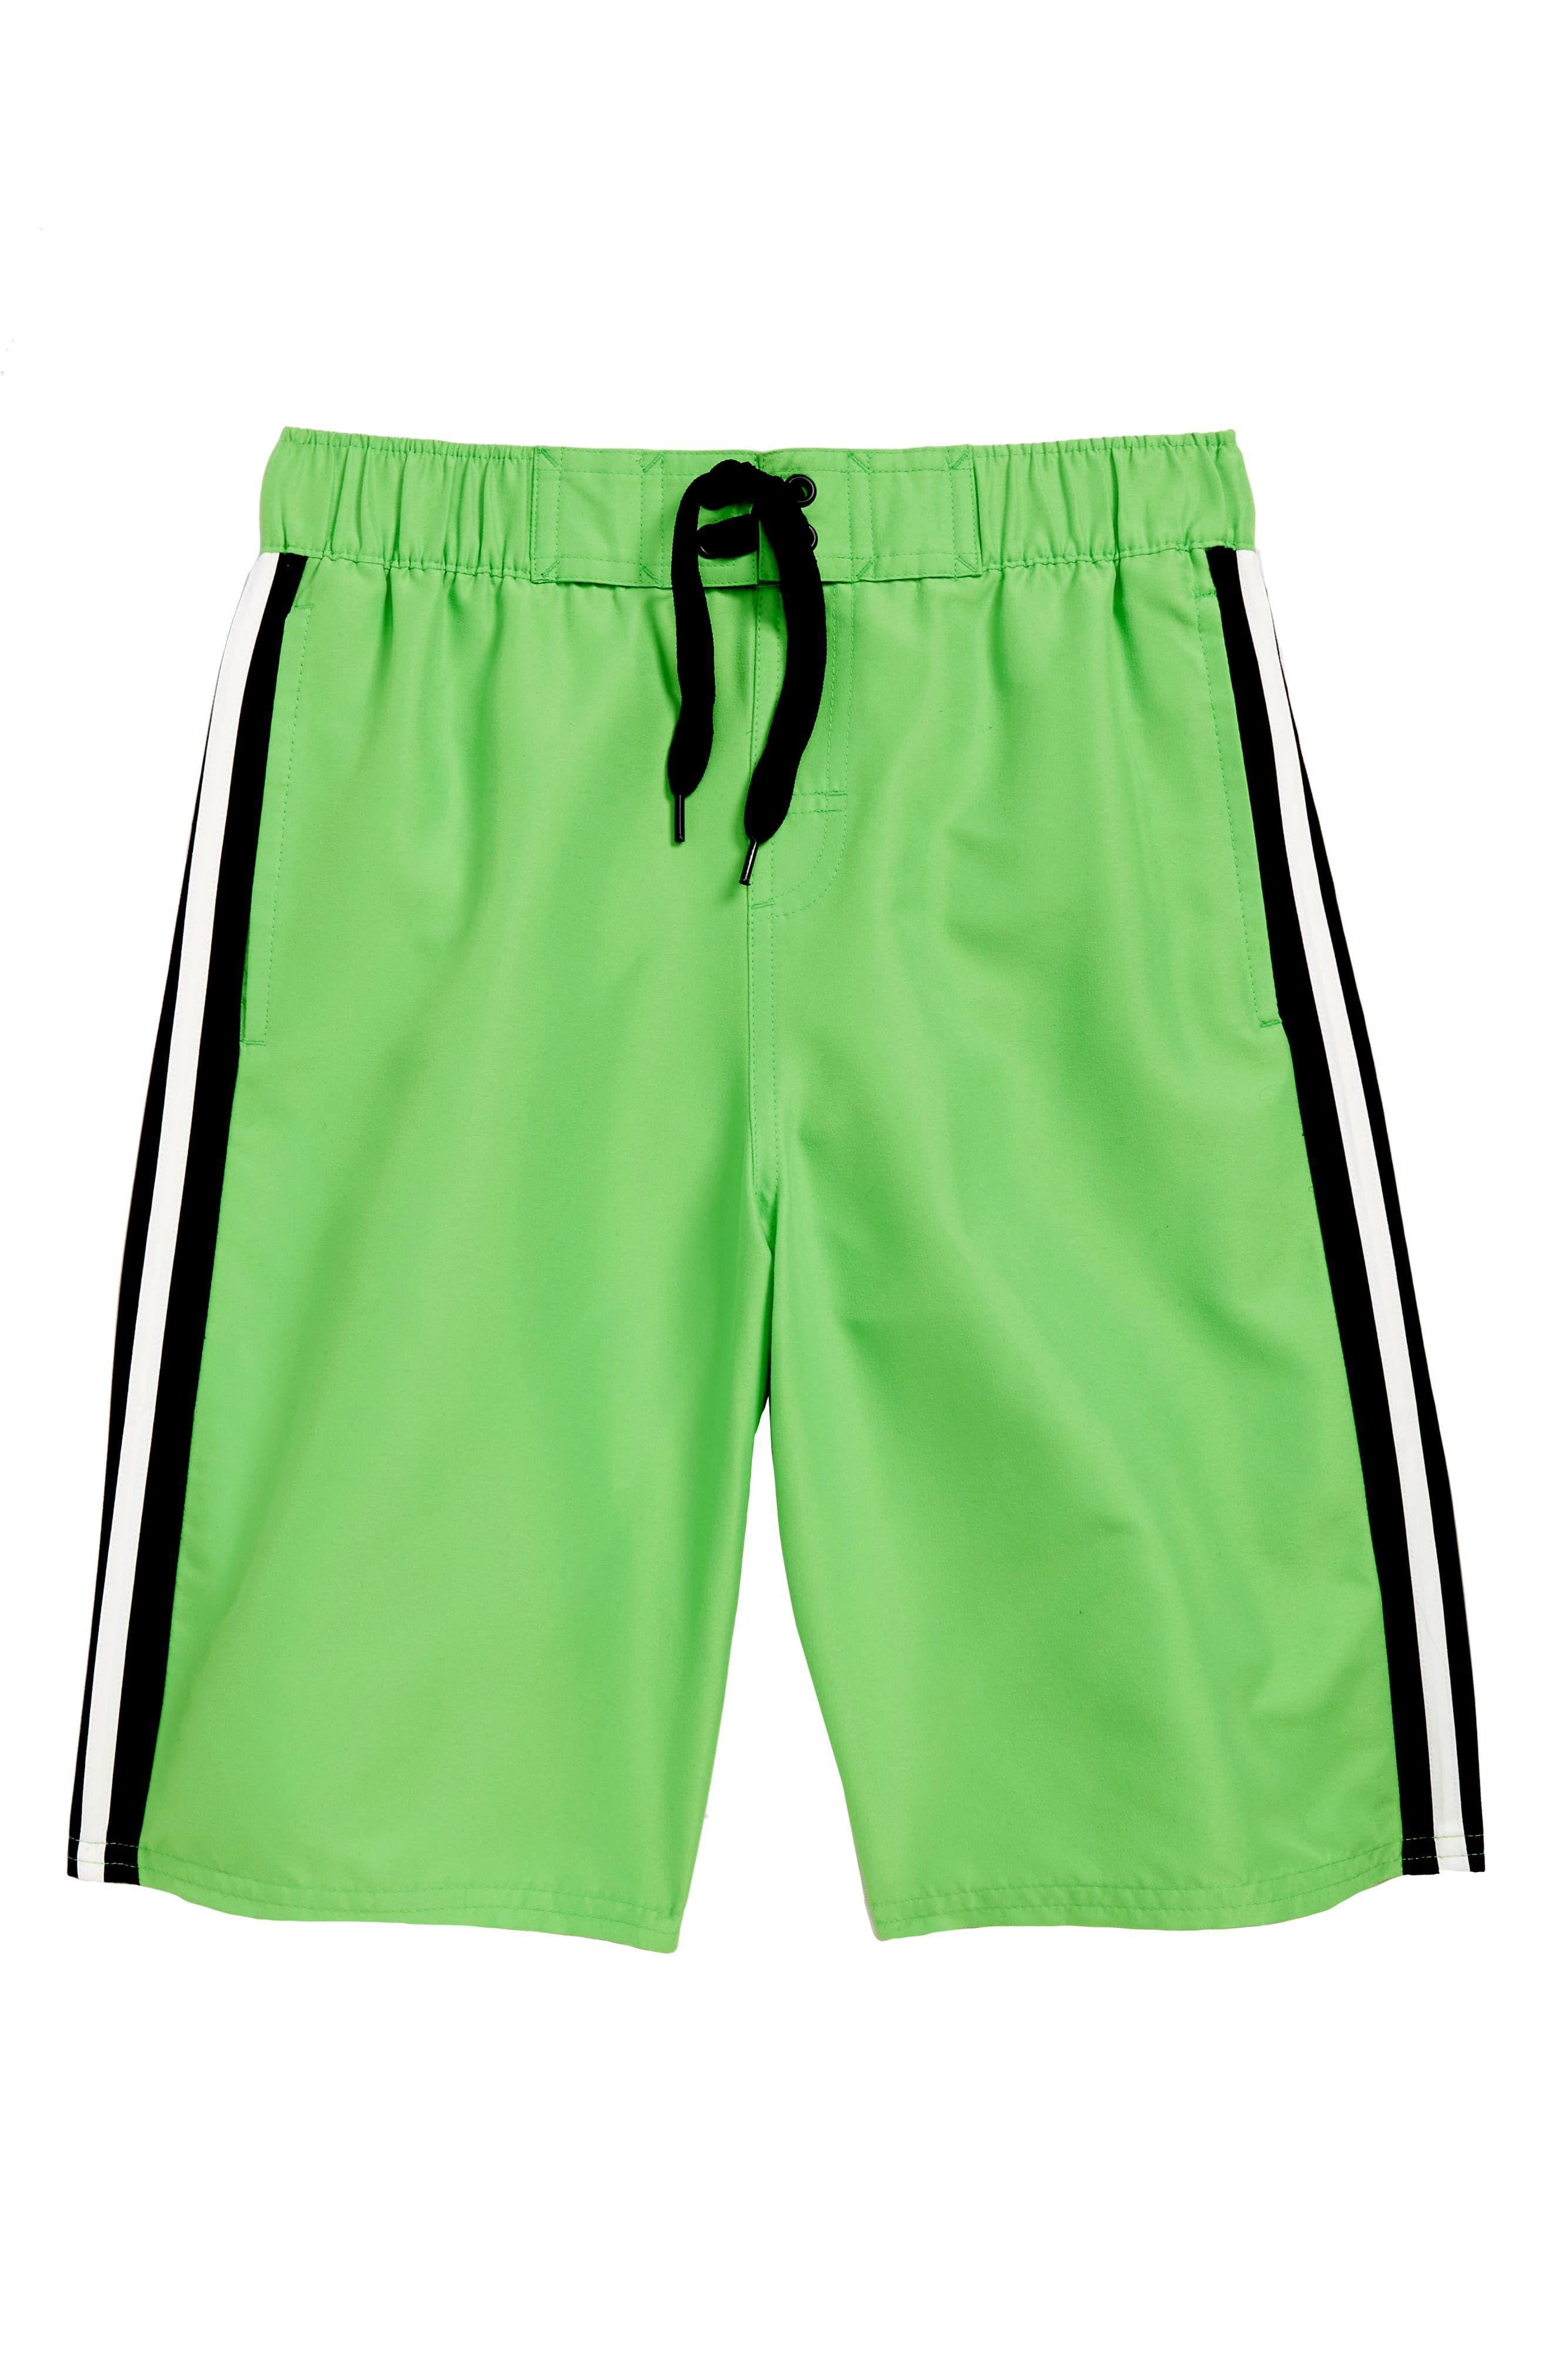 740b4bebfa Boy's Adidas Originals Iconic 3.0 Volley Swim Trunks, Size L (14-16) - Green